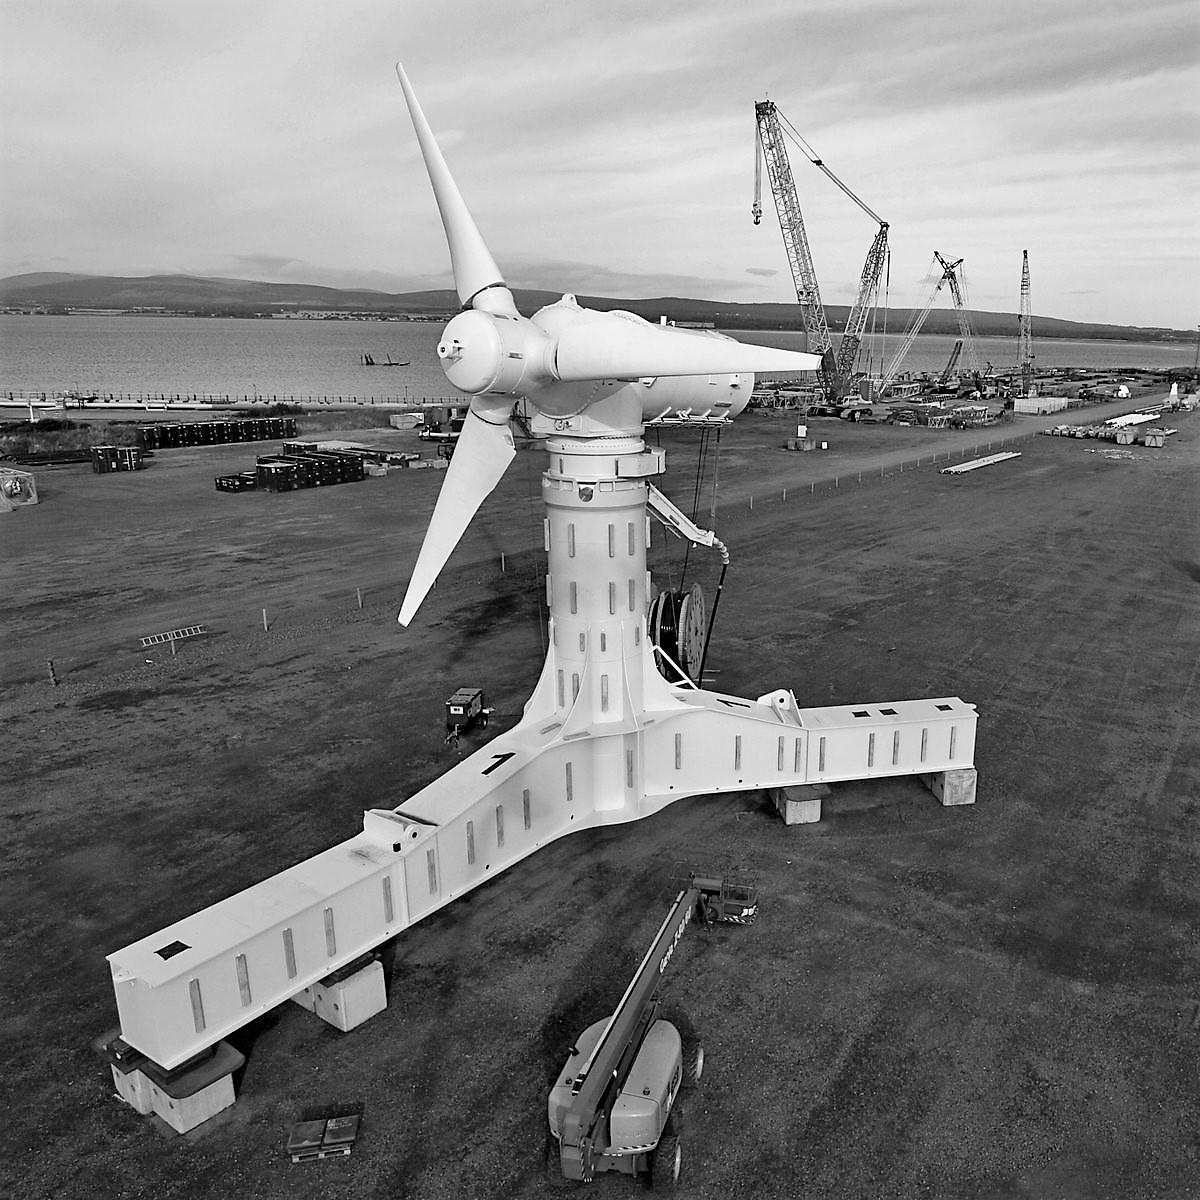 58b6d20ee12c2_MeyGen turbine Nov 2016.jpg